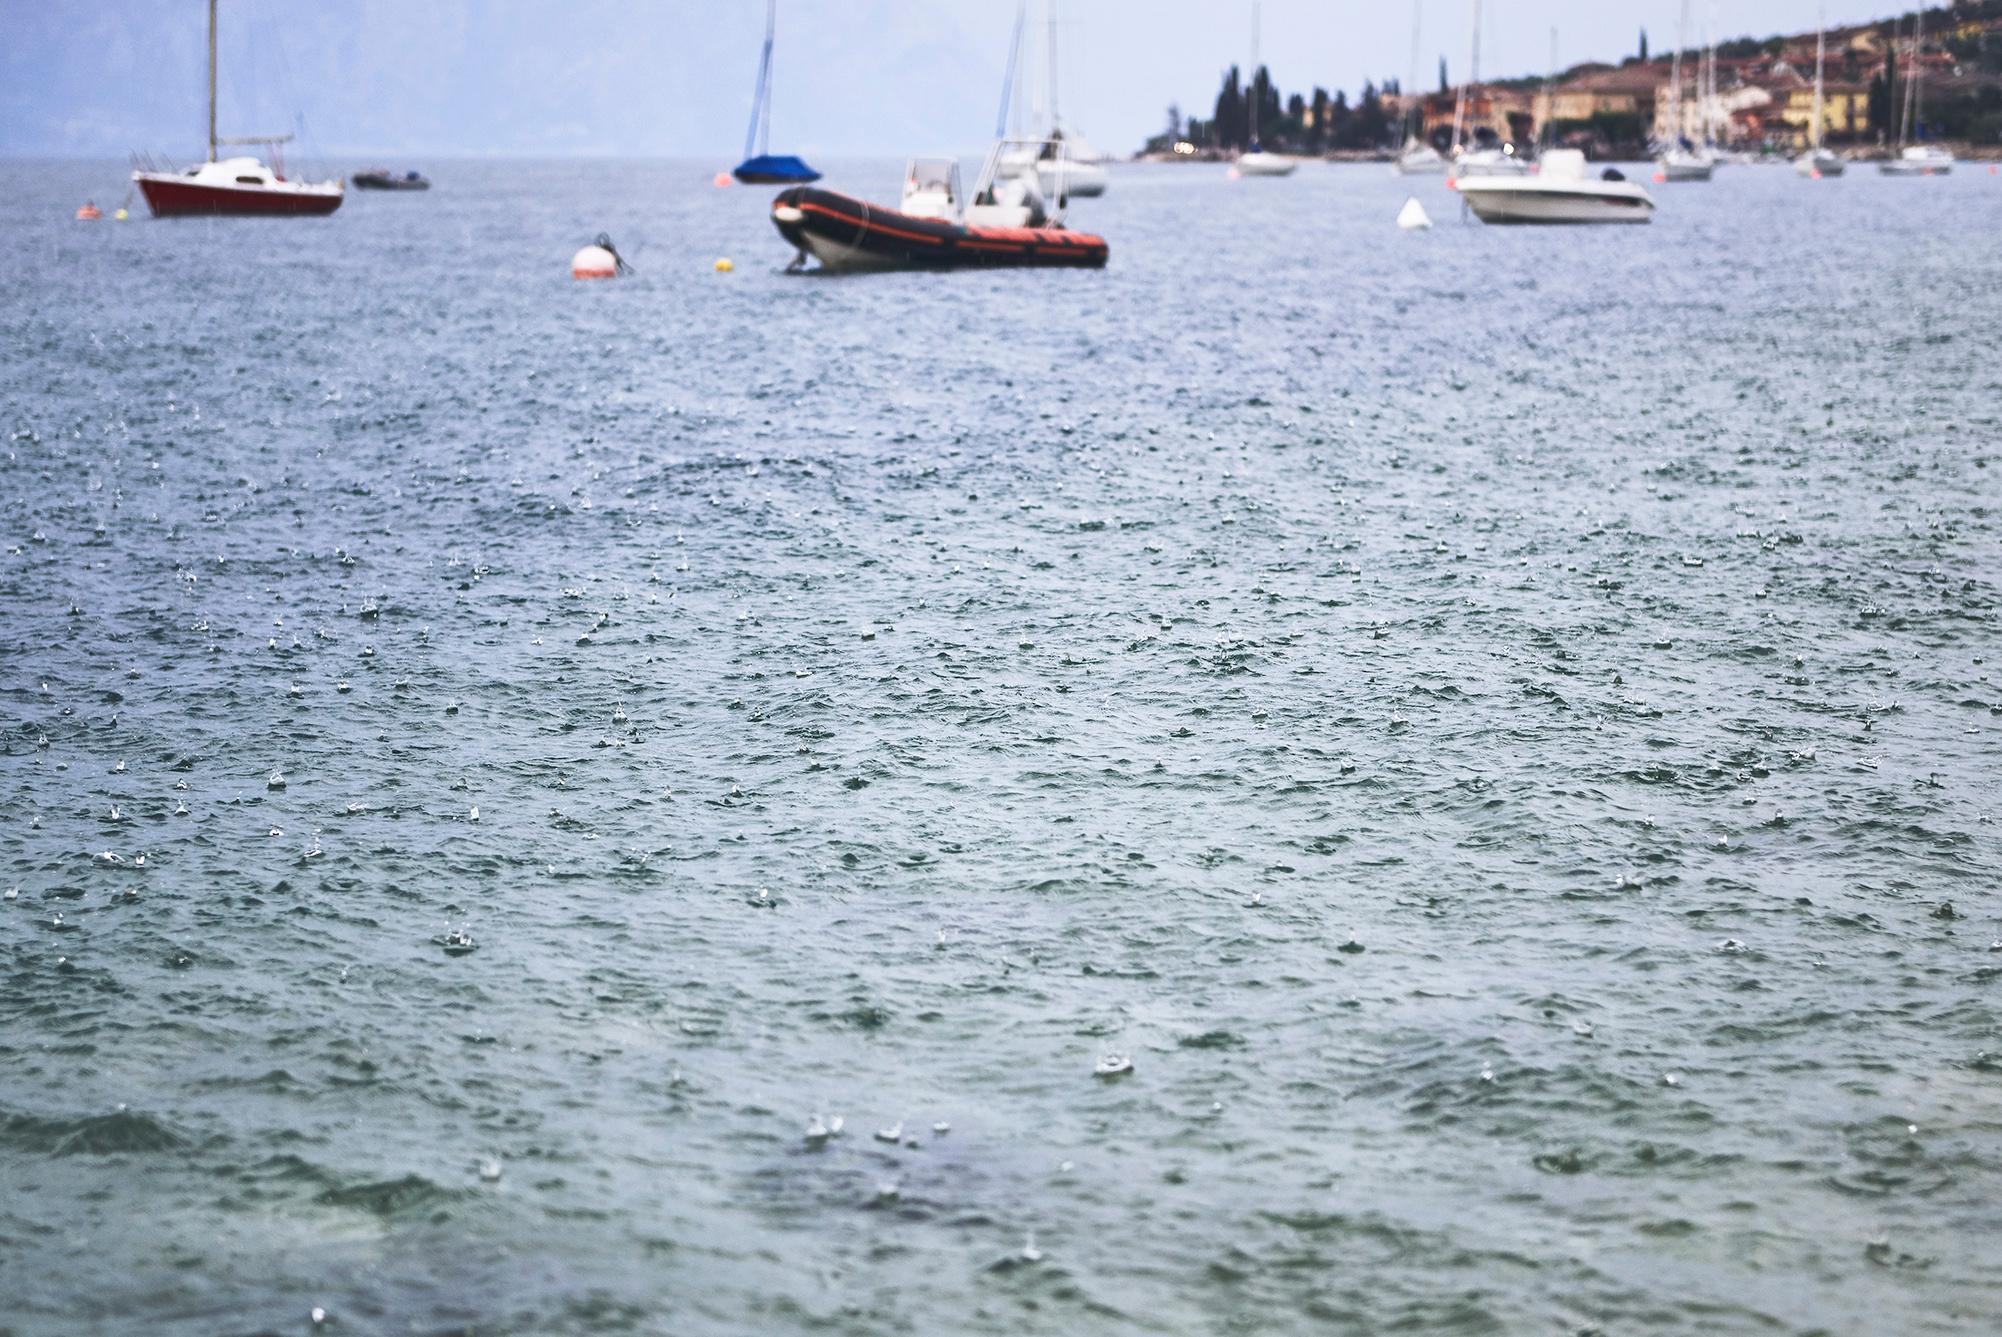 Boats in a rain storm on lake Garda, Italy. Kirsty Owen photography